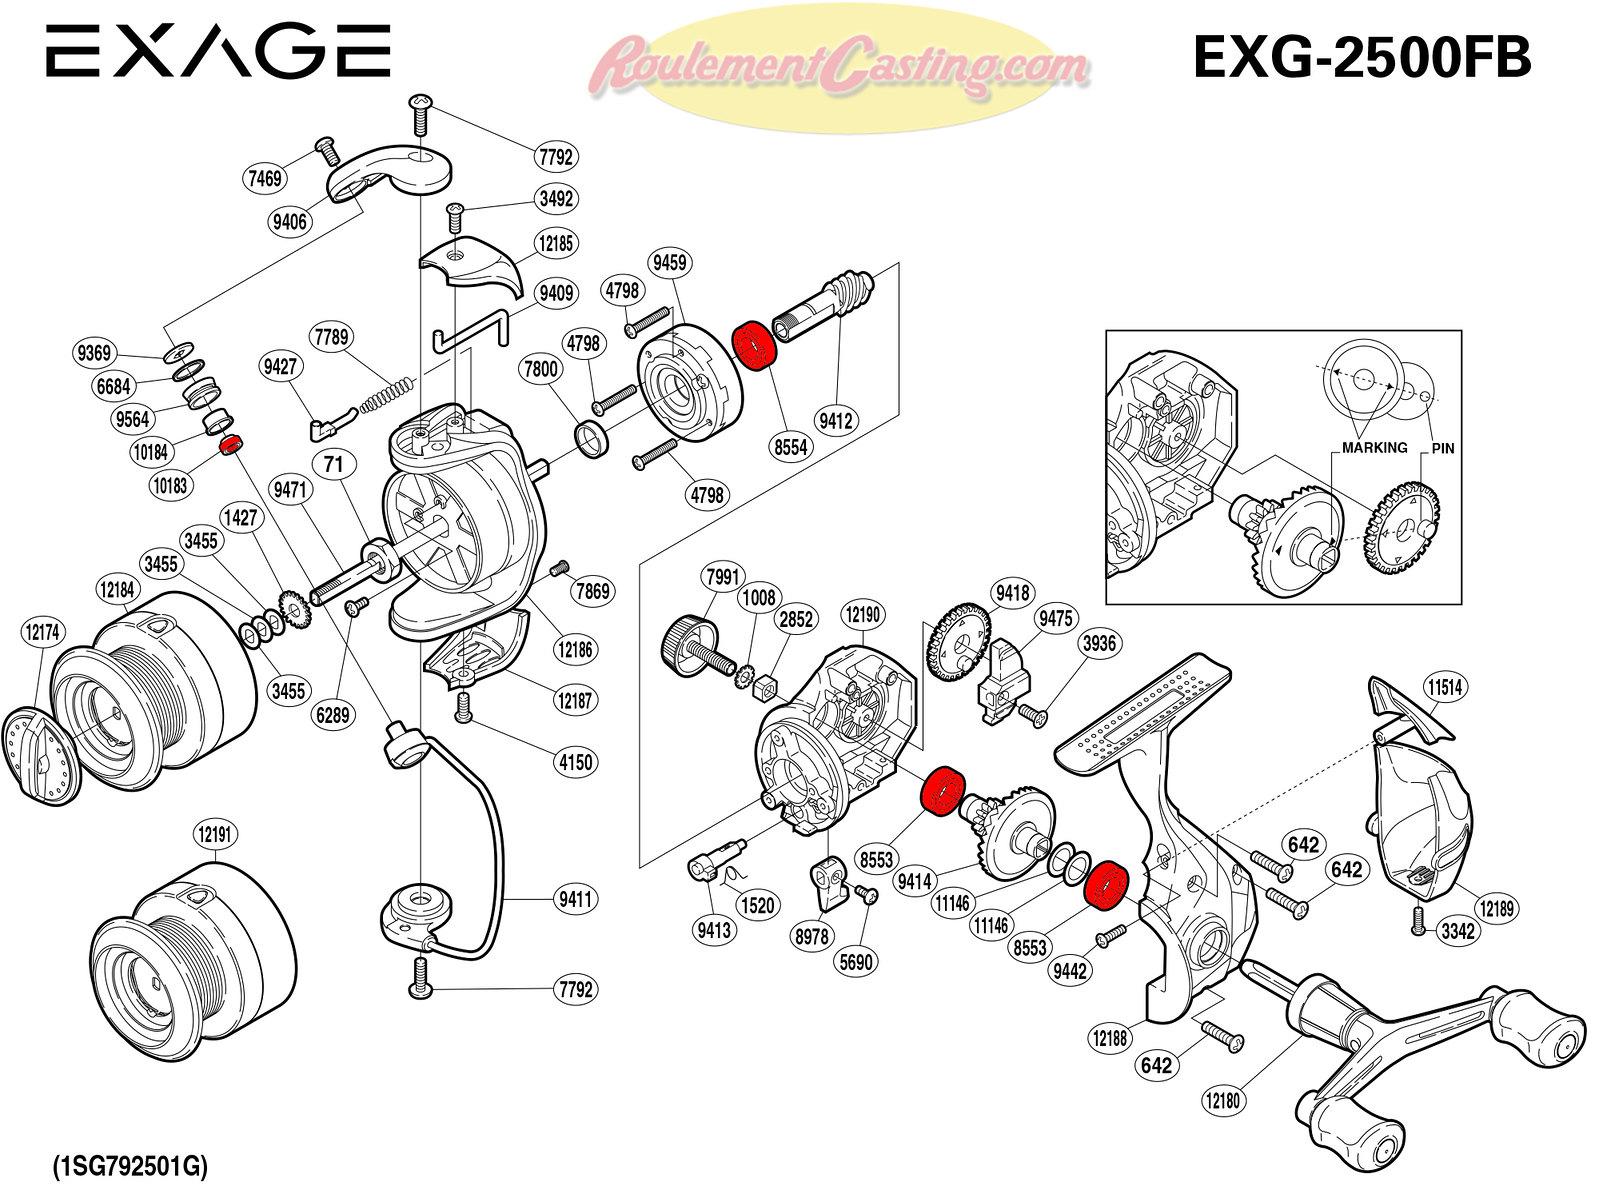 Schema-Shimano-EXAGE-2500FB